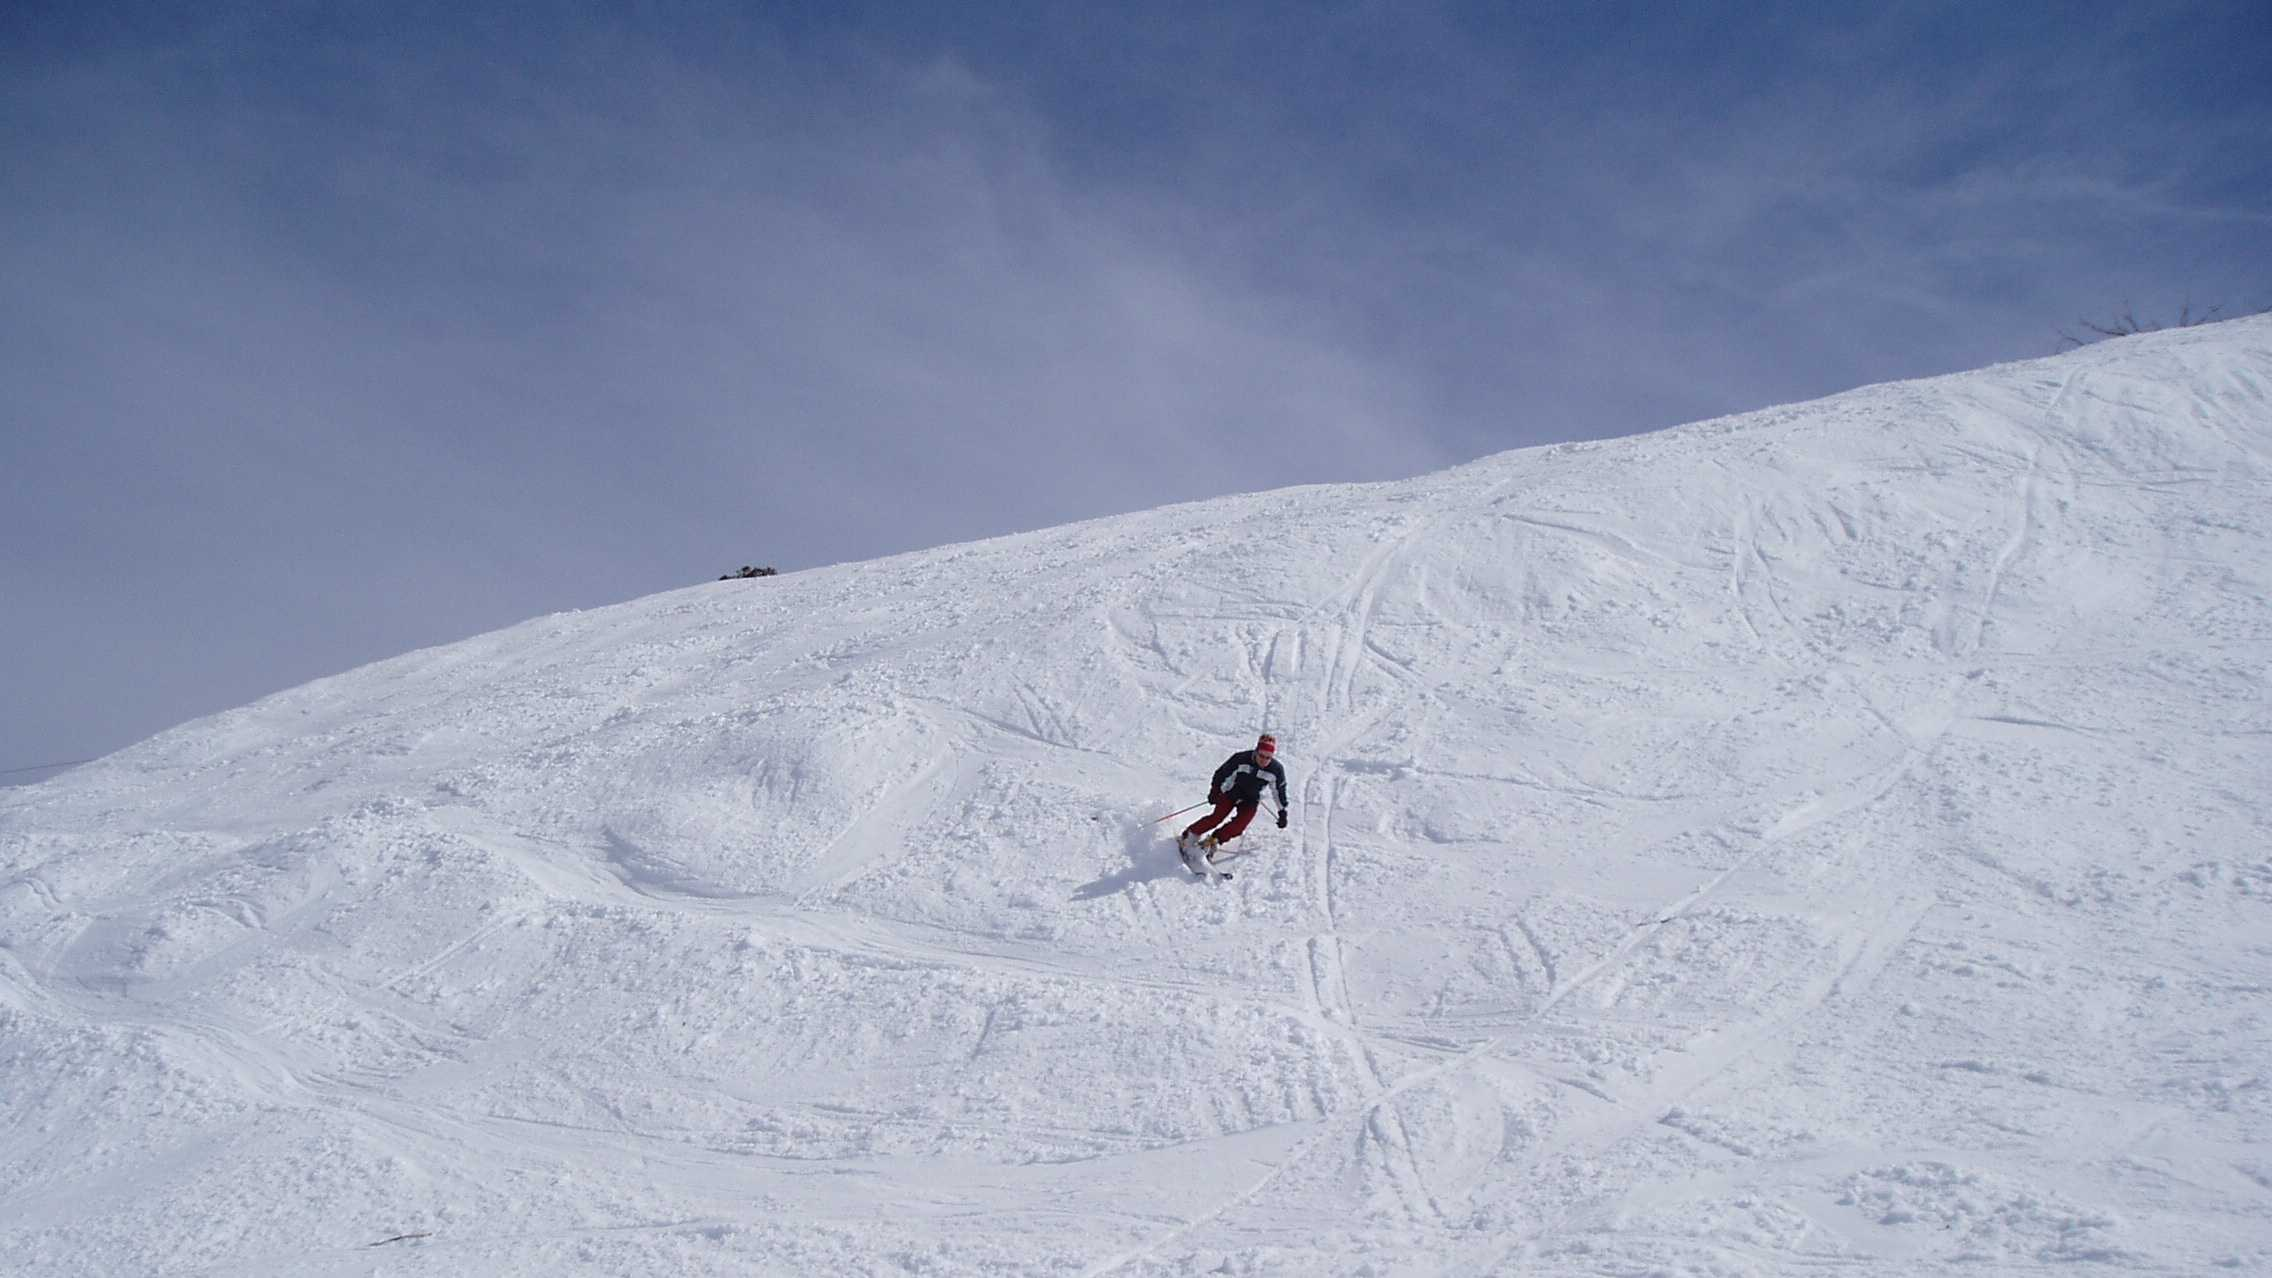 Whaleback Mountain Skiing